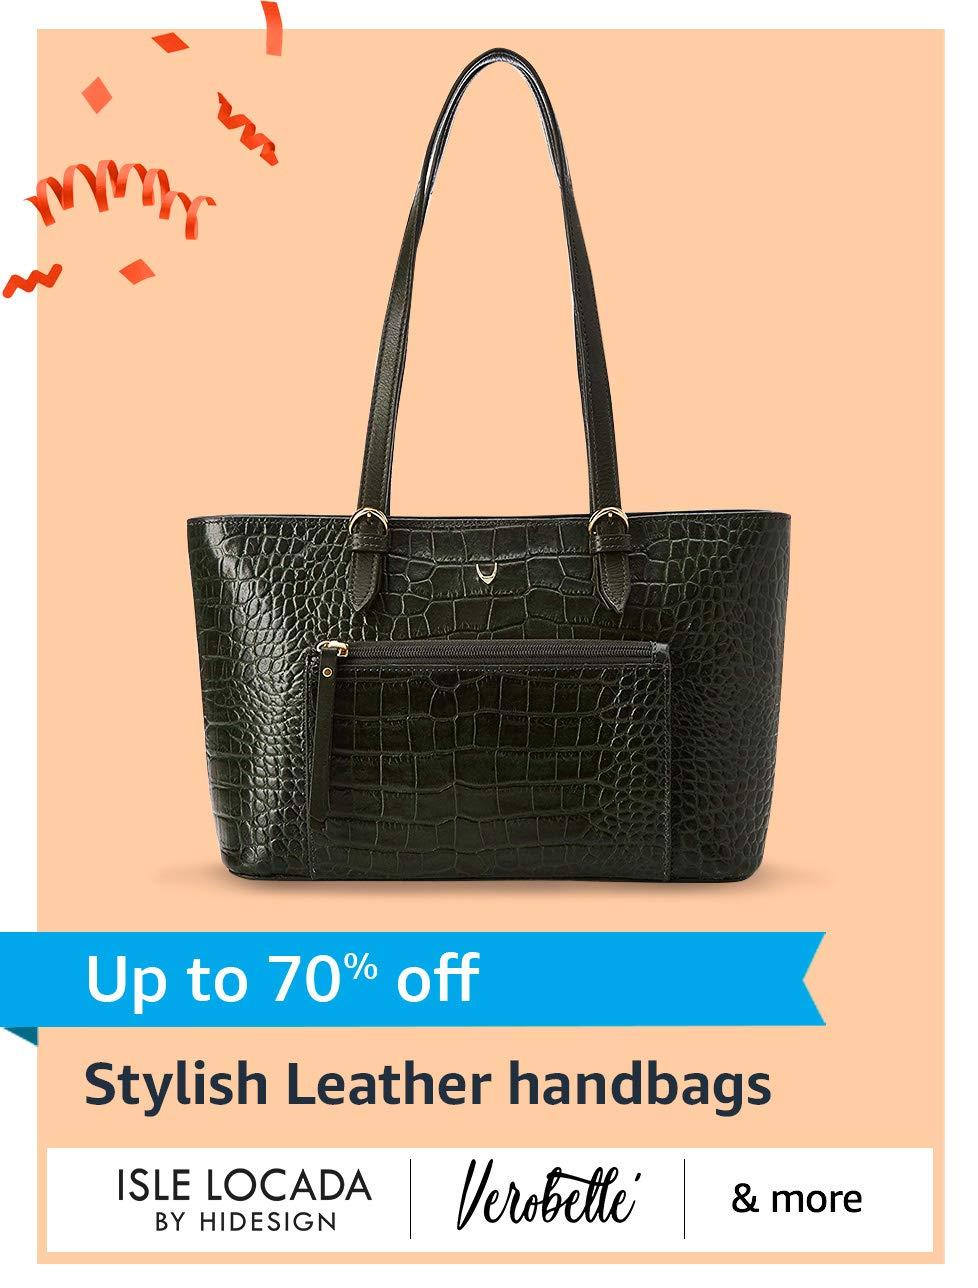 Stylish Leather handbags